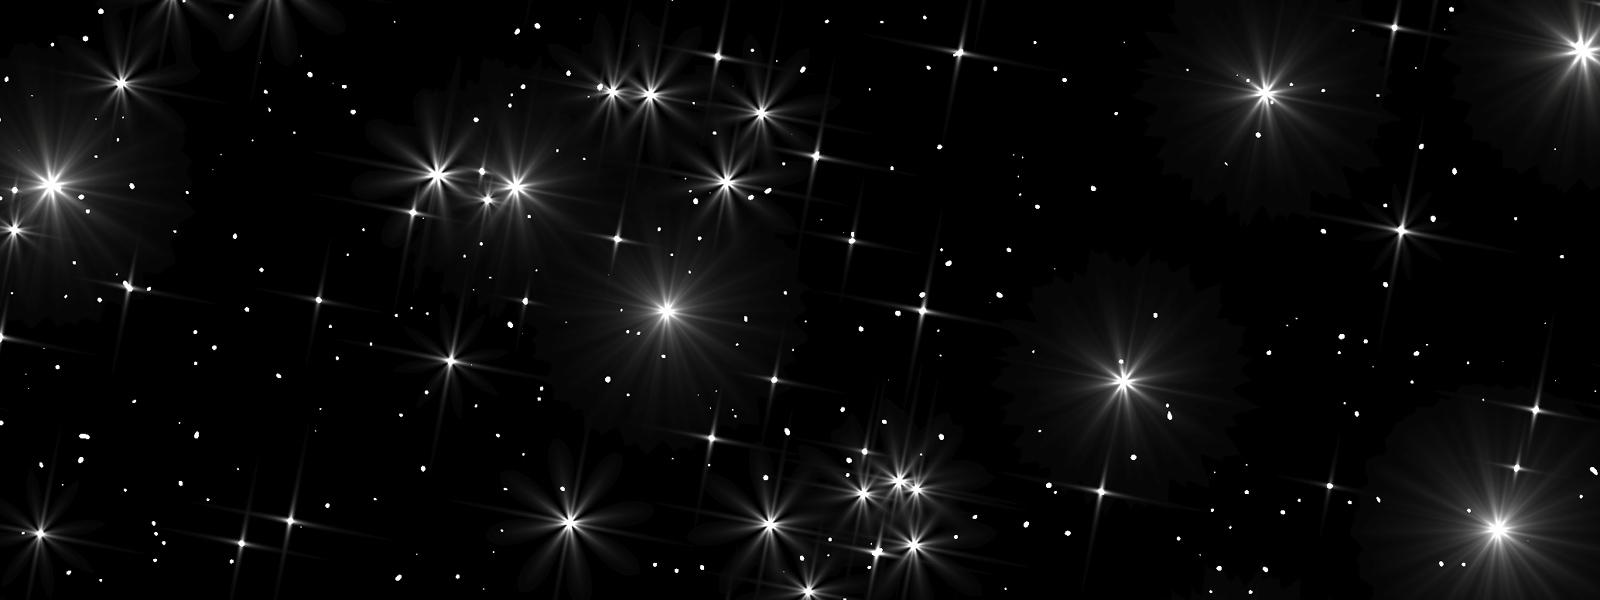 Stars against a black night sky